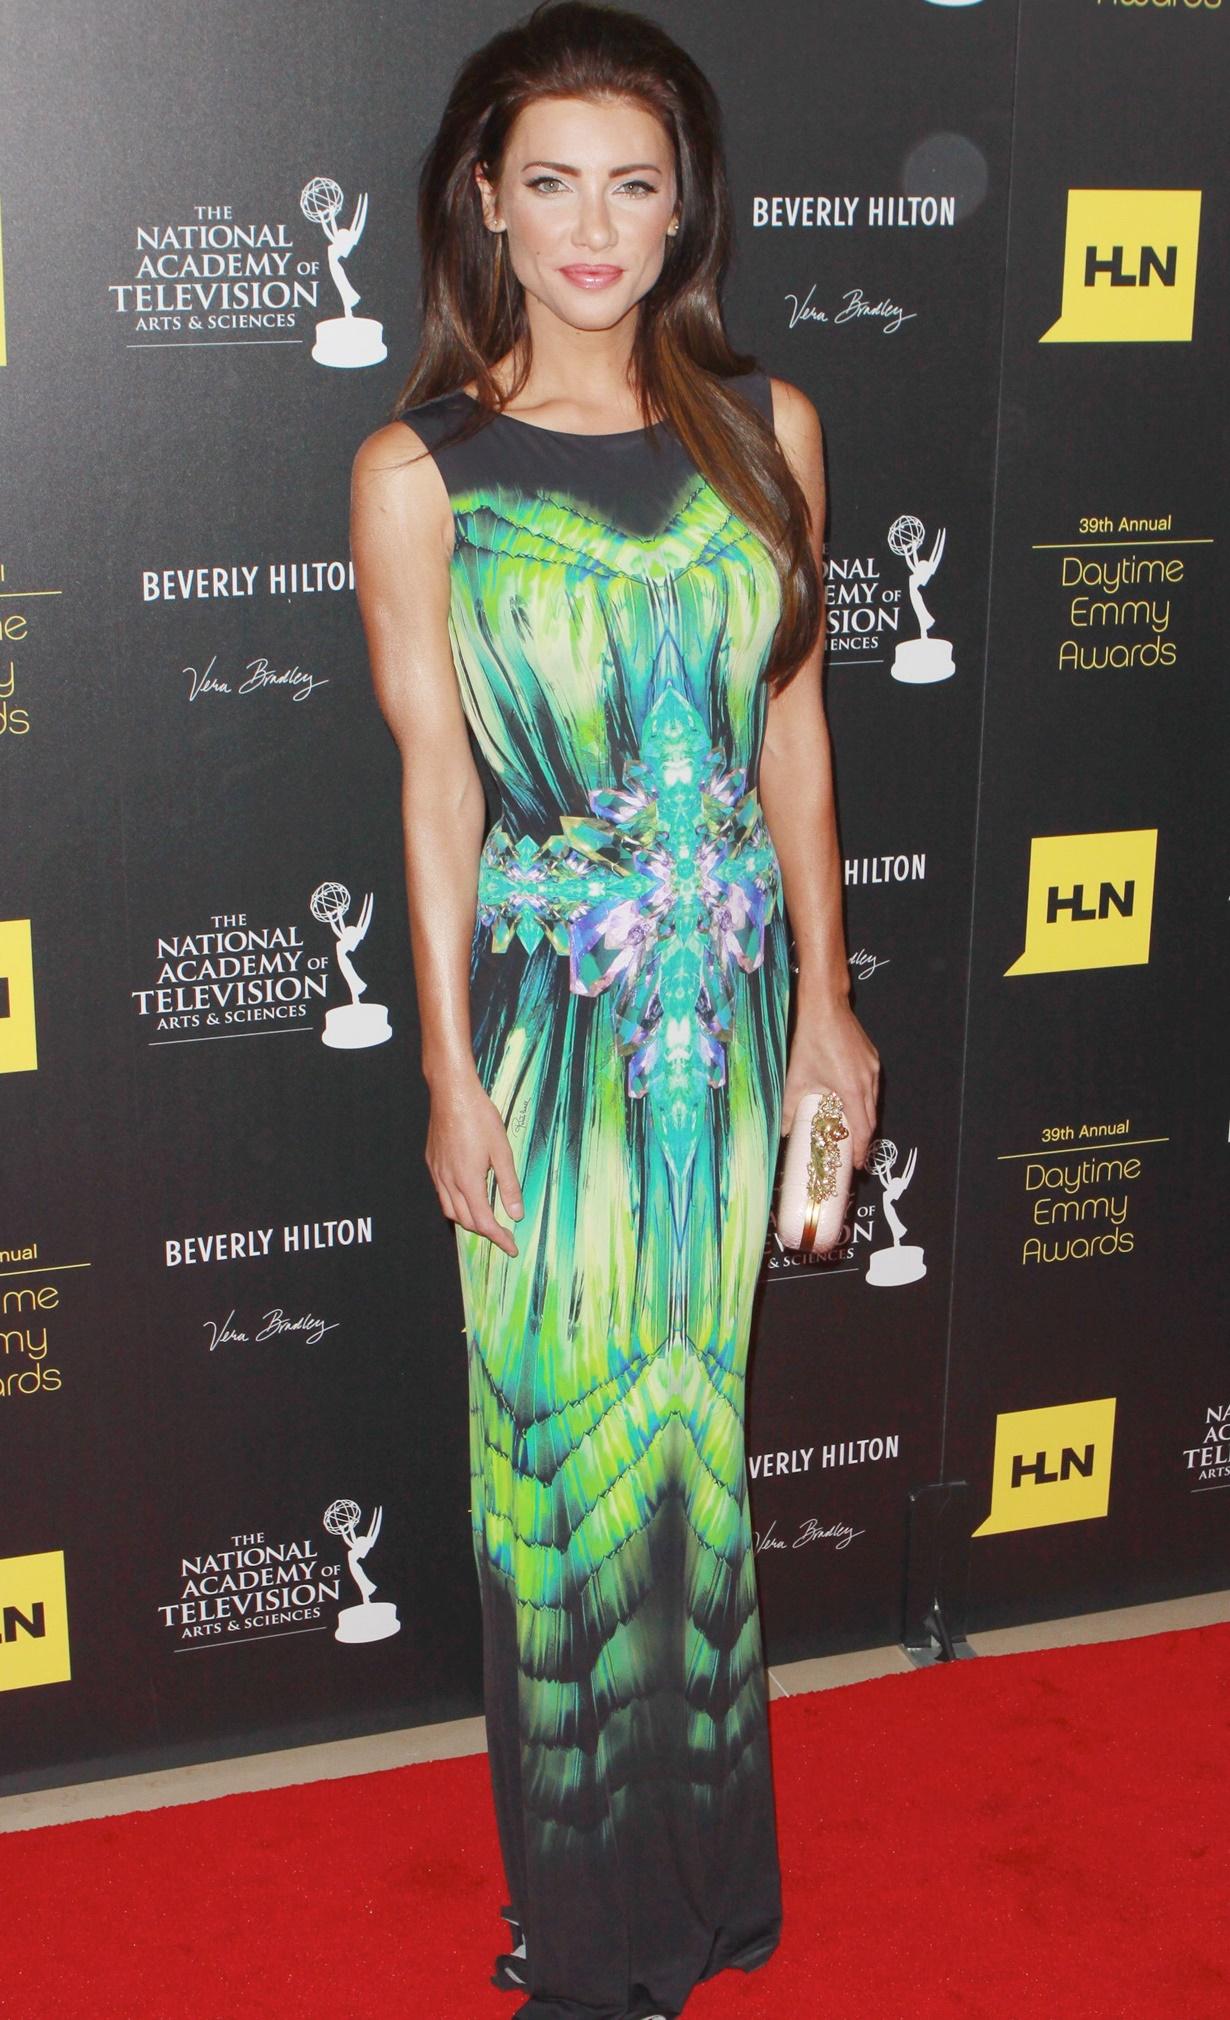 Jacqueline MacInnes Wood Daytime Emmys 2012 B&B